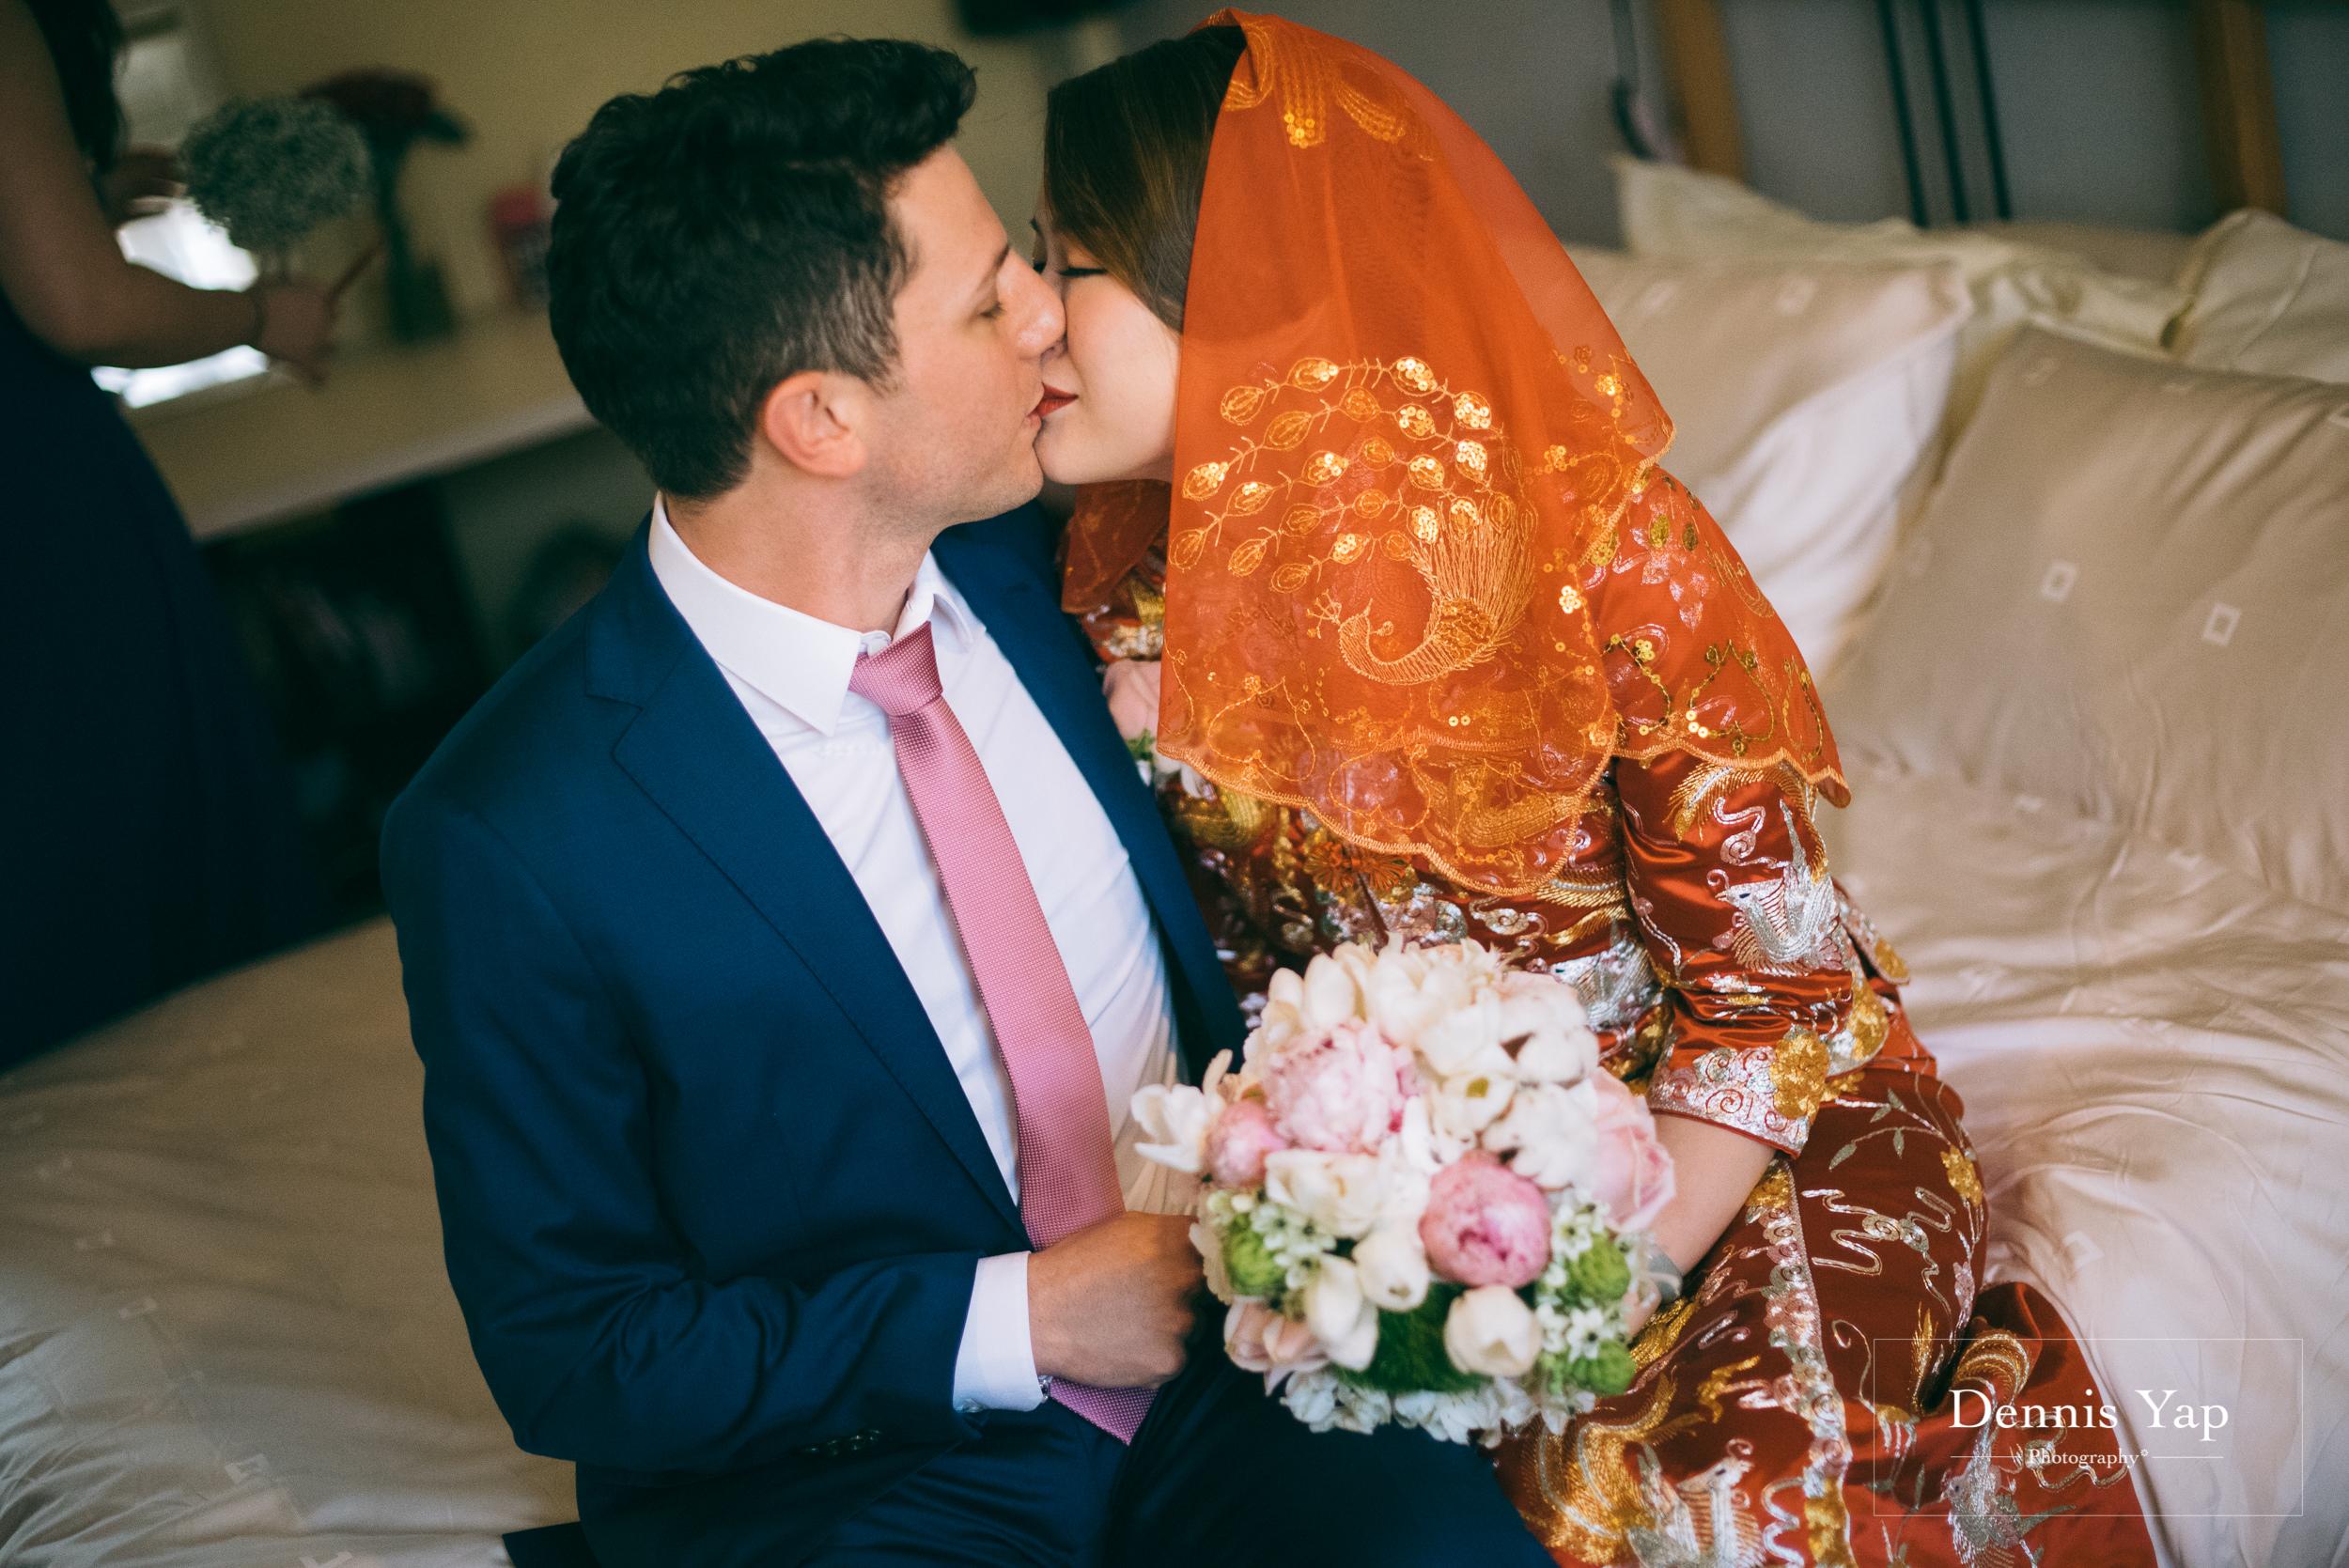 jordan amanda wedding day westin hotel kuala lumpur choe family dennis yap photography-13.jpg